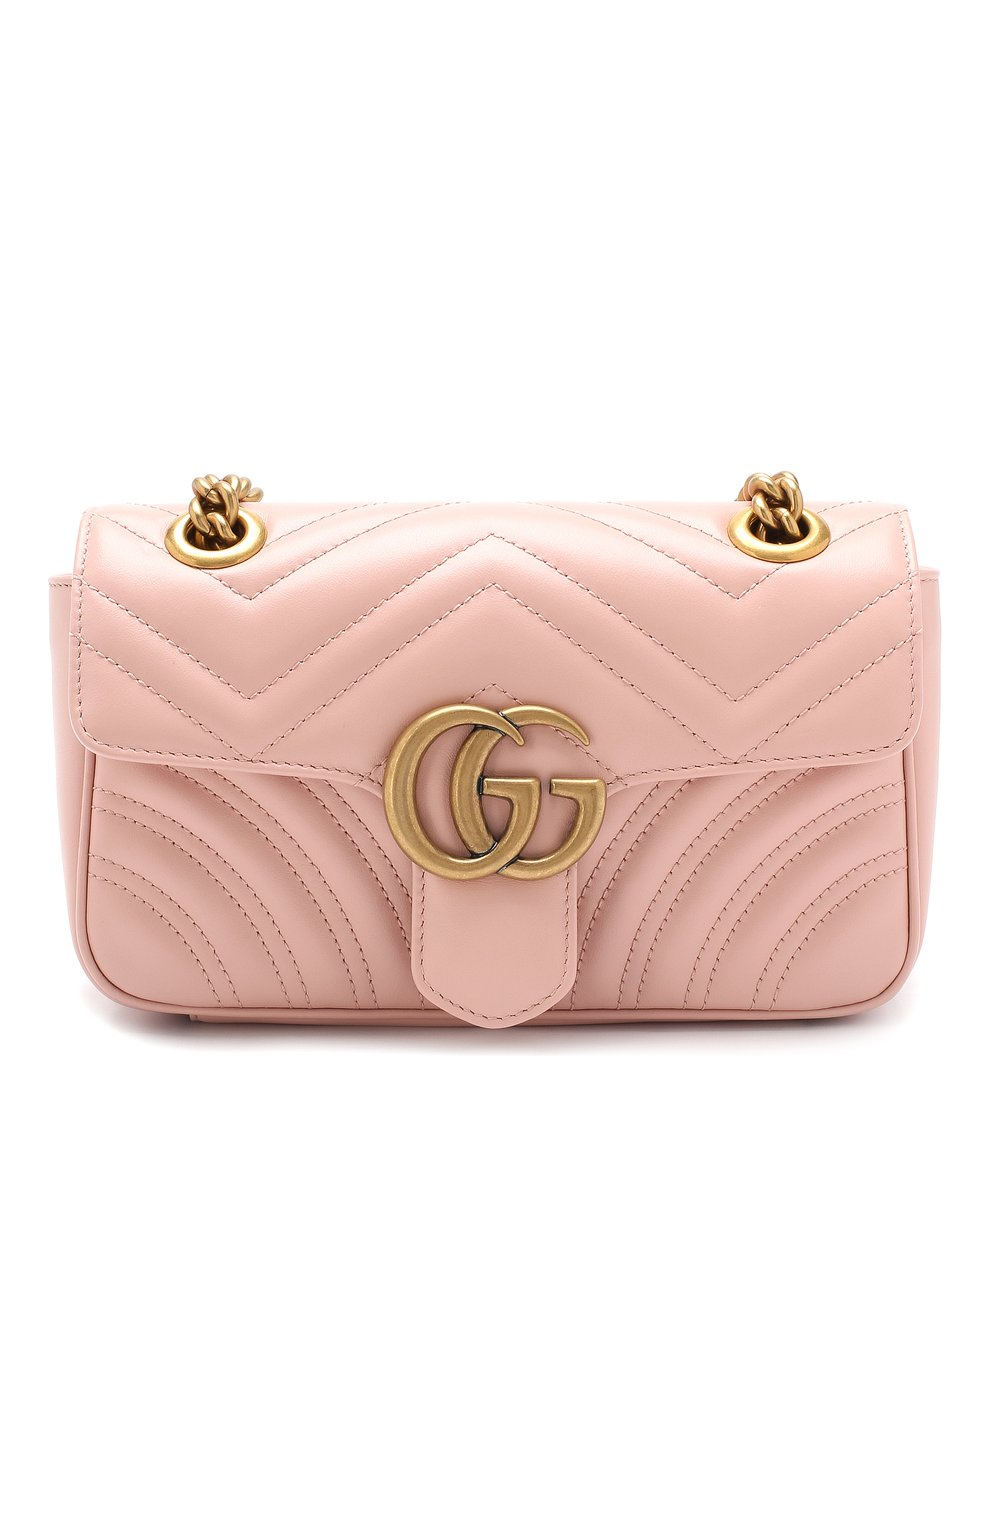 Сумка GG Marmont Gucci розовая цвета | Фото №1